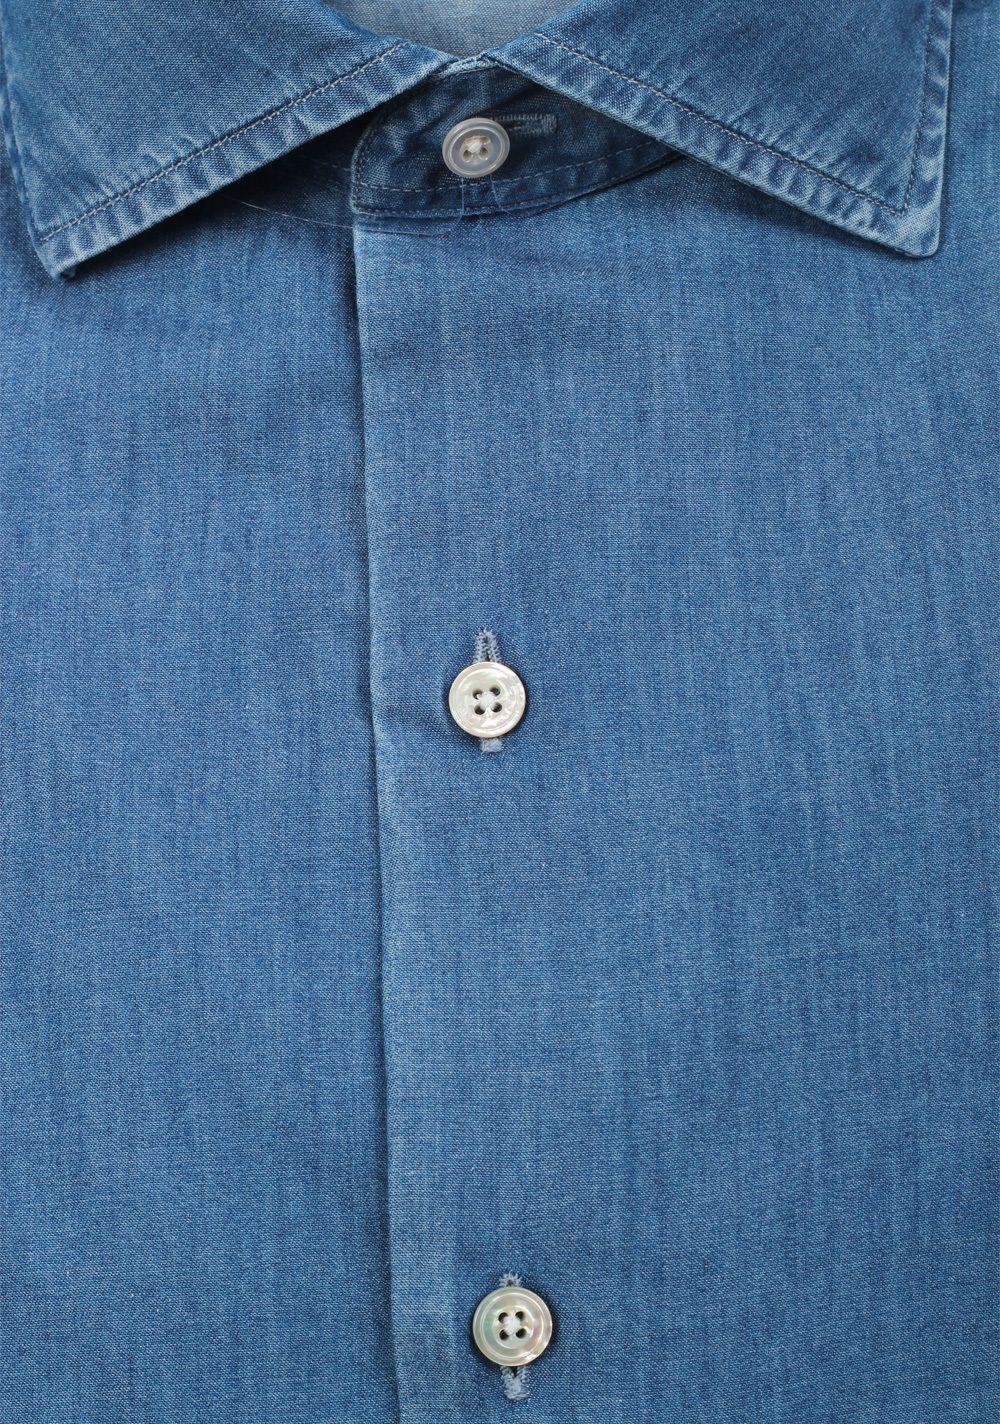 TOM FORD Solid Blue Denim Dress Shirt Size 42 / 16,5 U.S. | Costume Limité